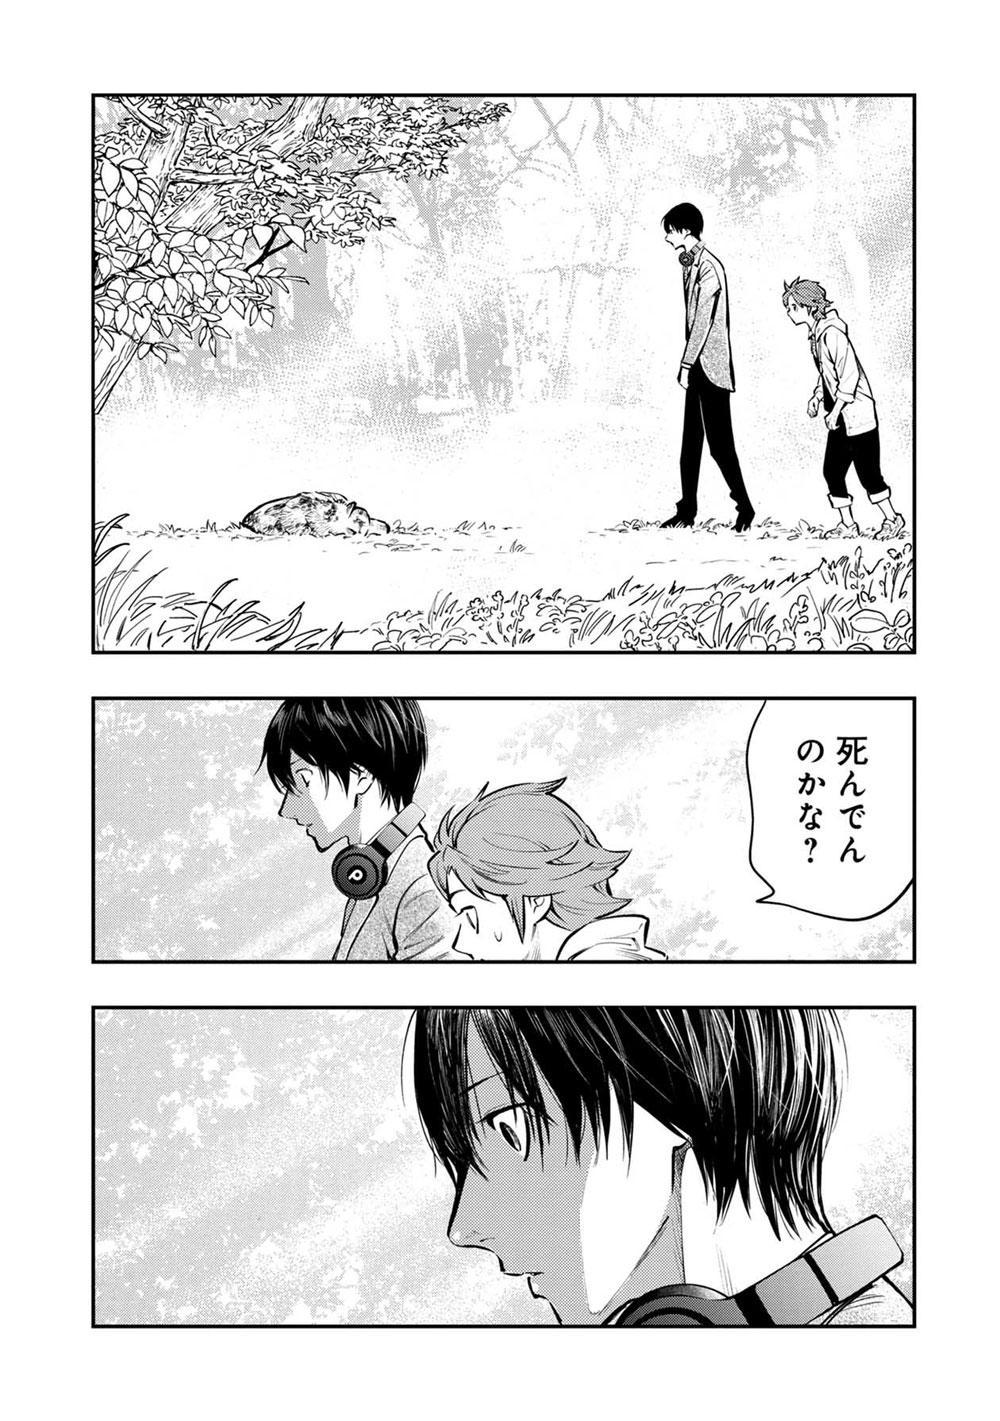 inugami_re_002_012.jpg